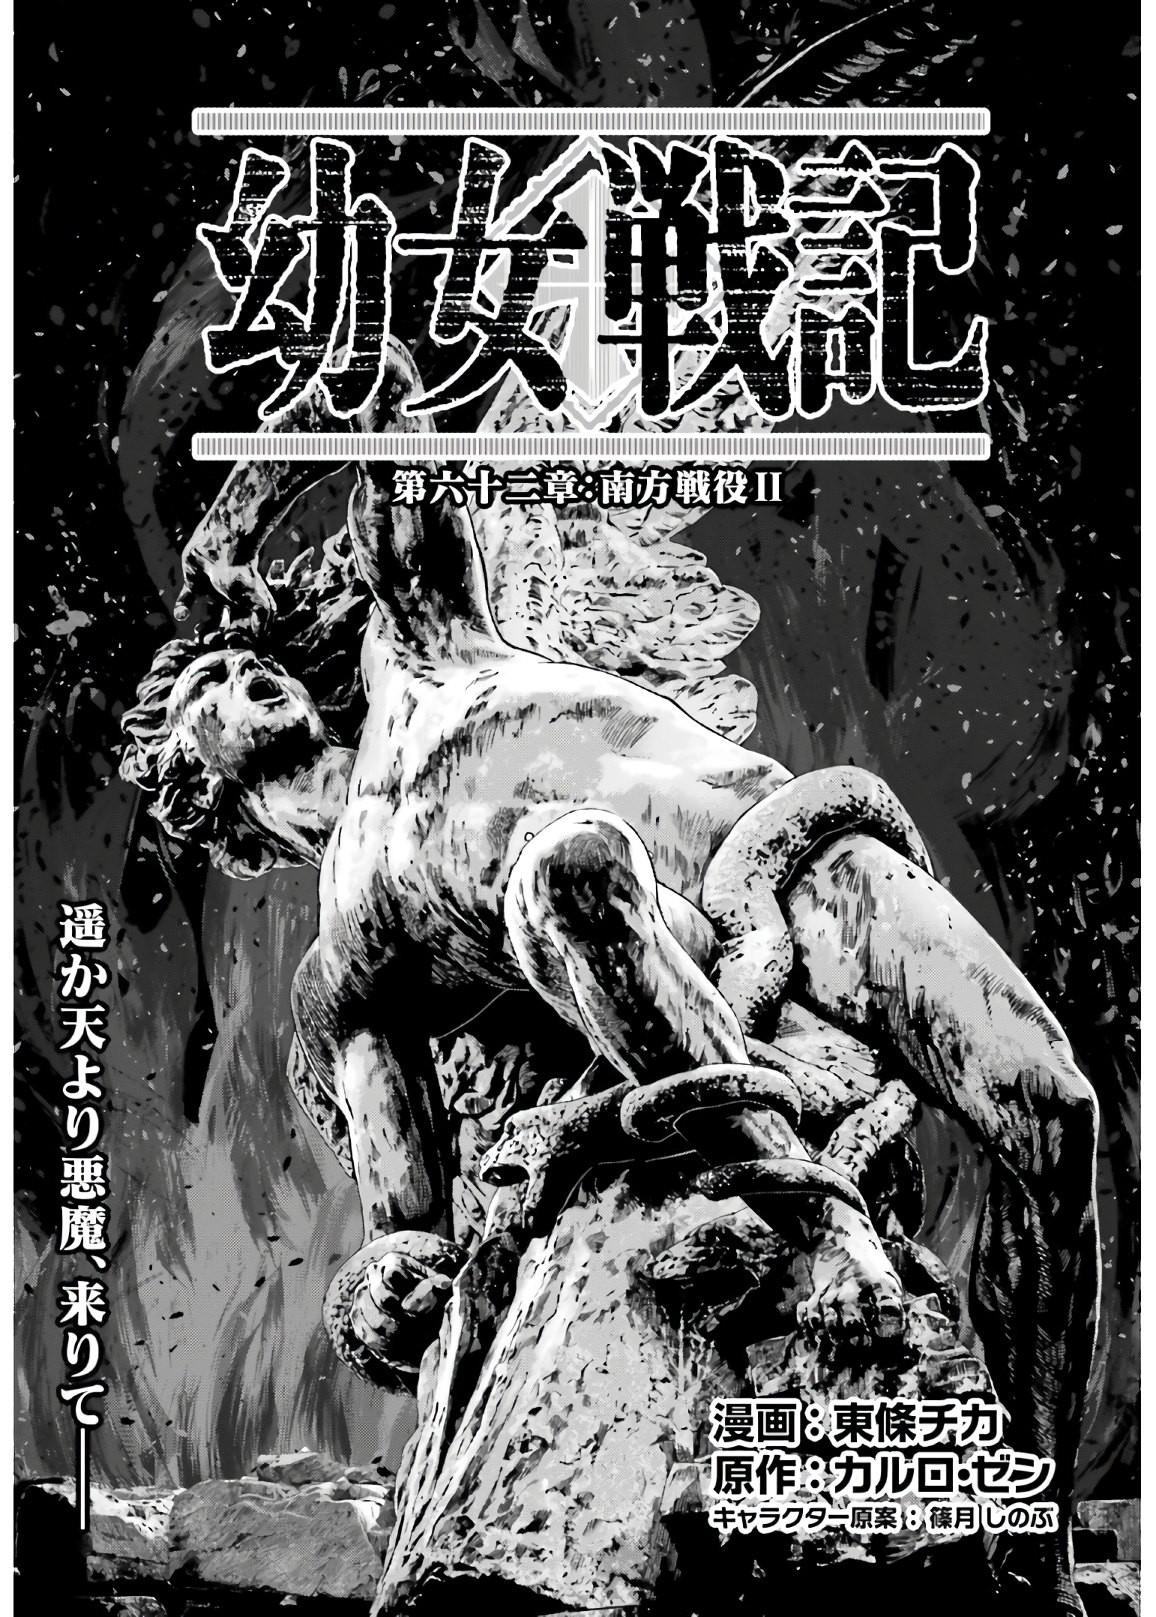 Youjo Senki - Chapter 62 - Page 1